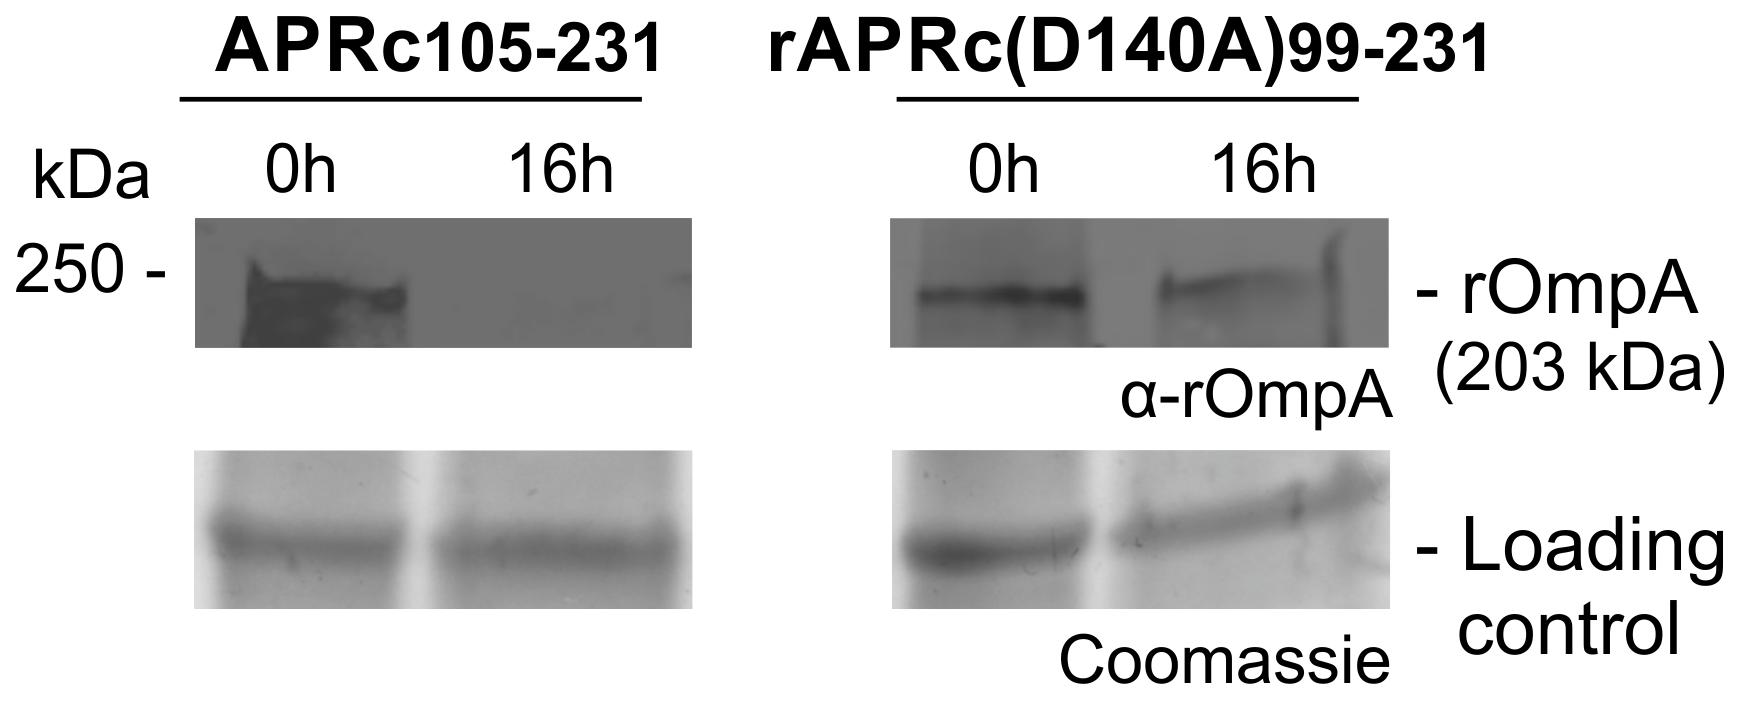 APRc can process rOmpA <i>in vitro</i>.